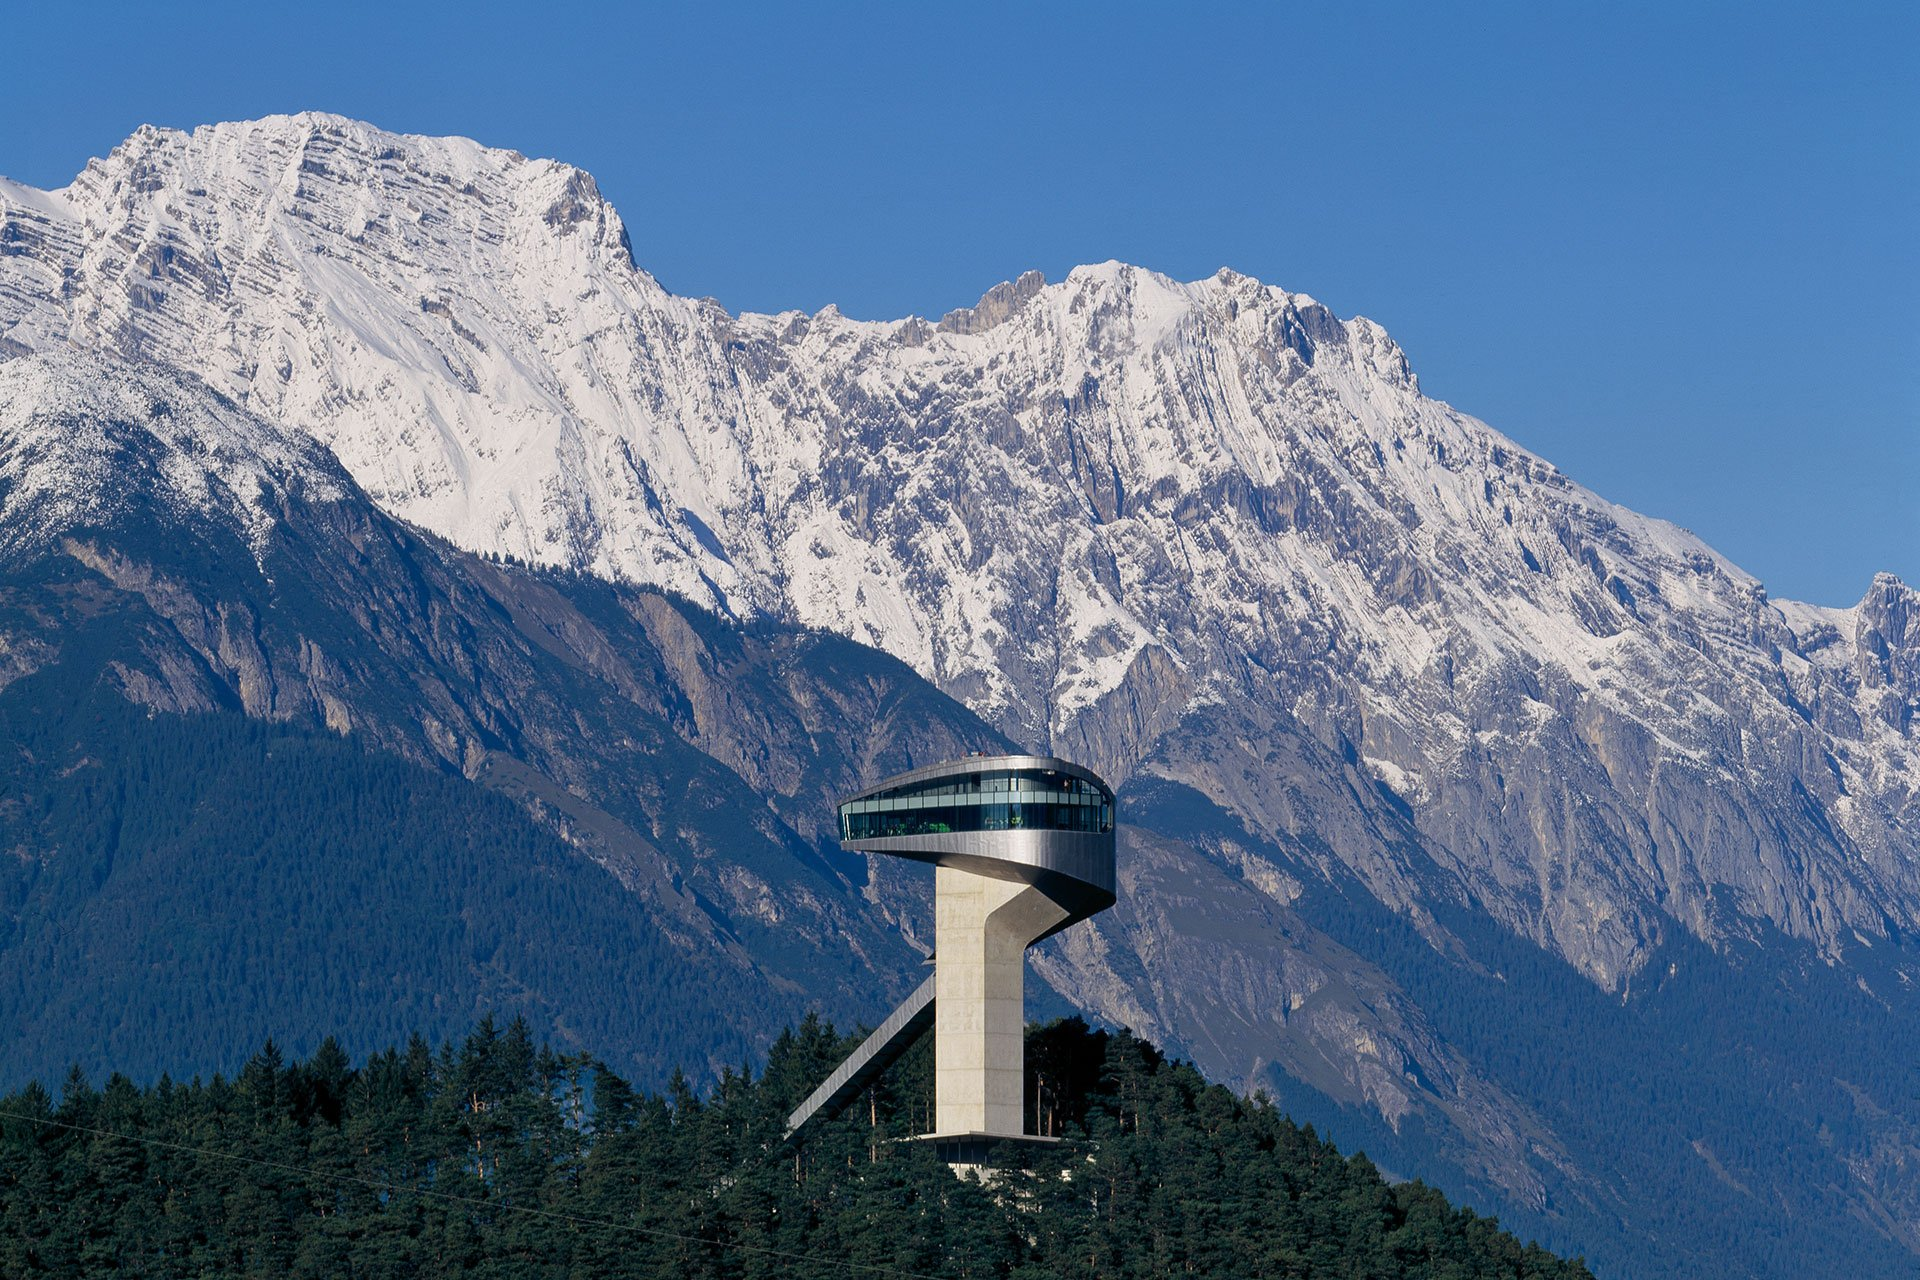 bergisel skijump austria architectural lighting design OVI Chinese